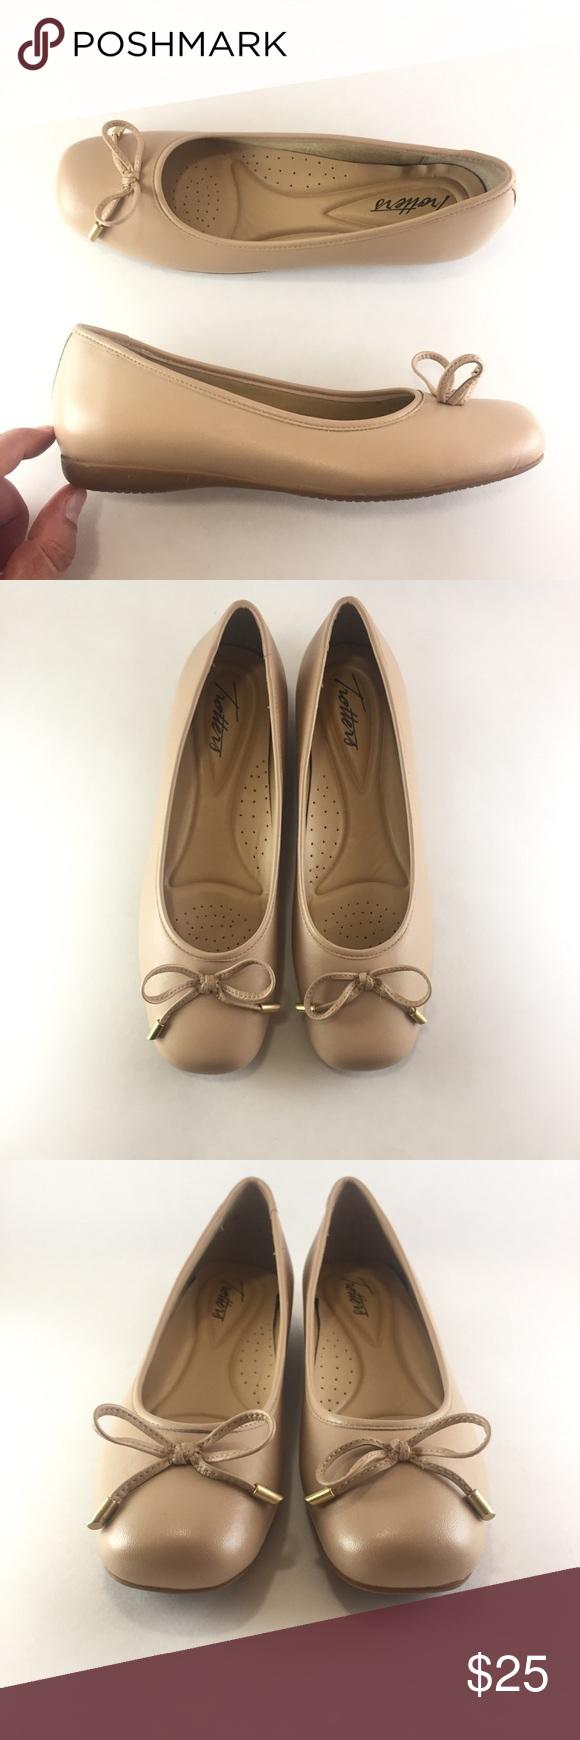 Trotters Womens Sante Ballet Flat